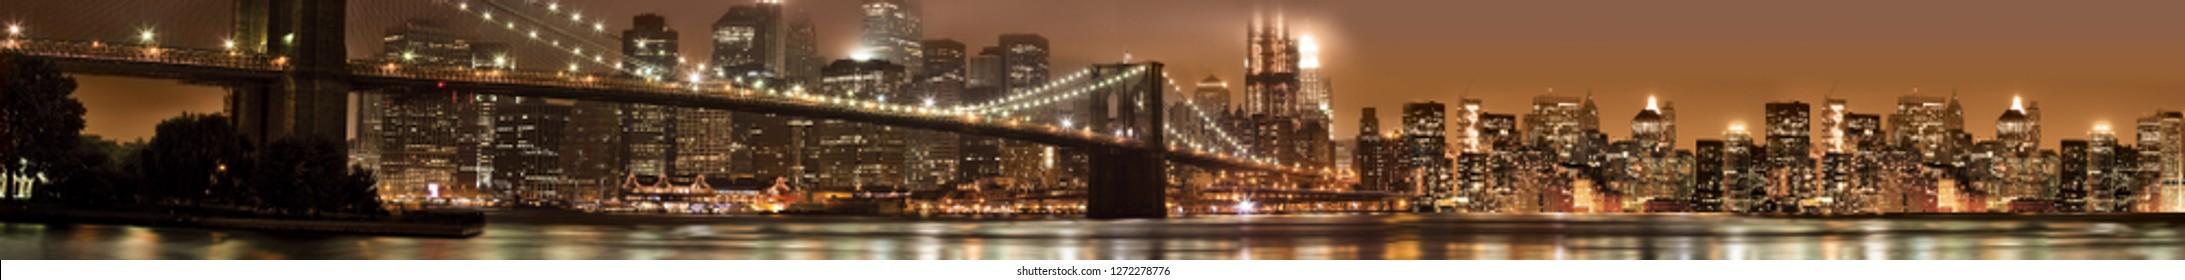 Panorama of New York City Manhattan. Brooklyn Bridge at night. Horizontal view for a glass panels (skinali).